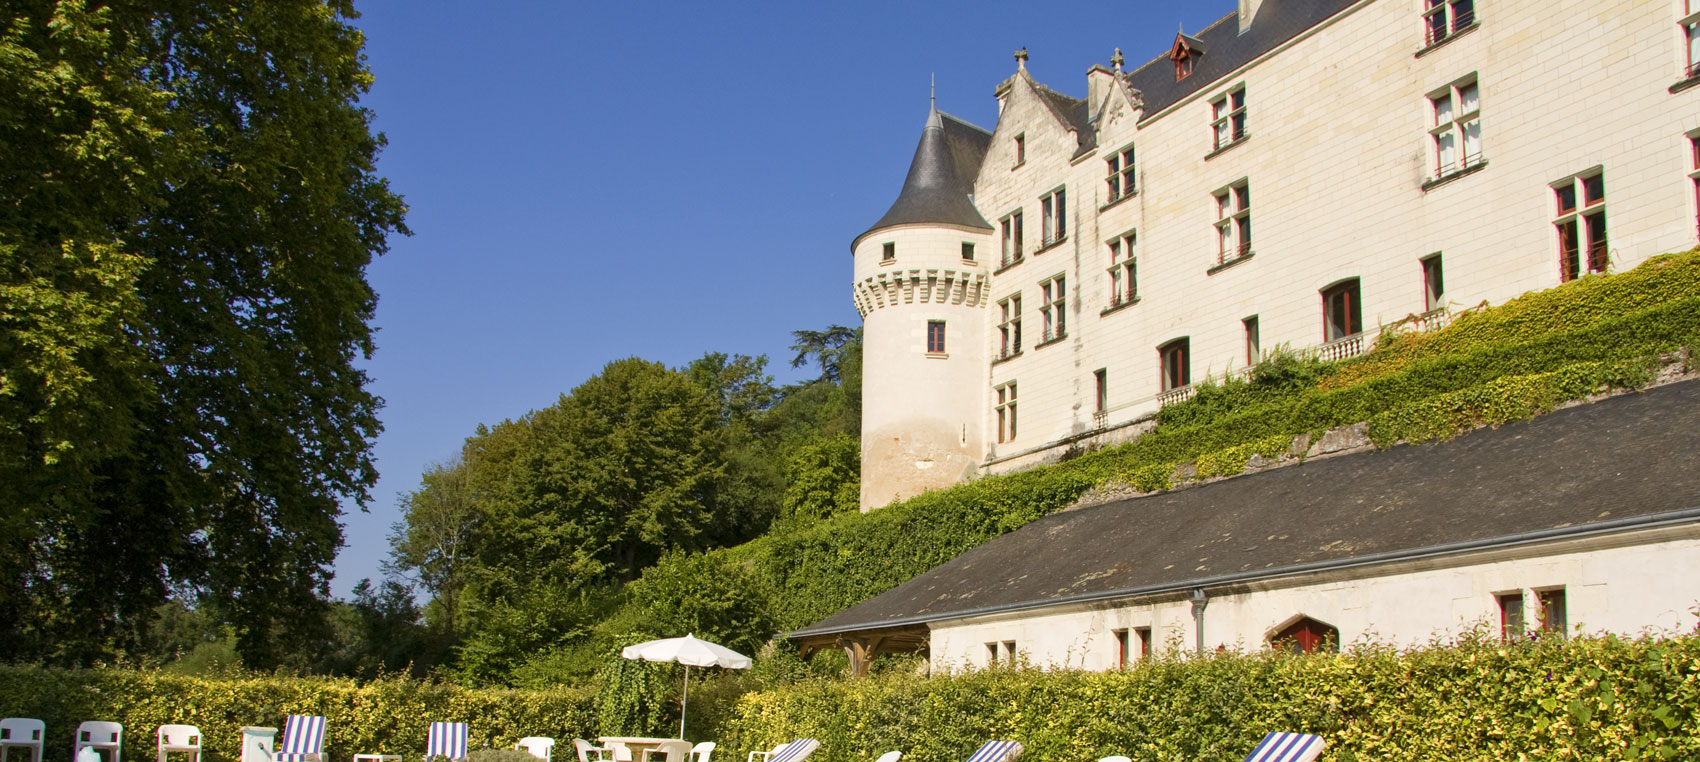 Chateau de Chissay - Hotel in Chissay-en-Touraine